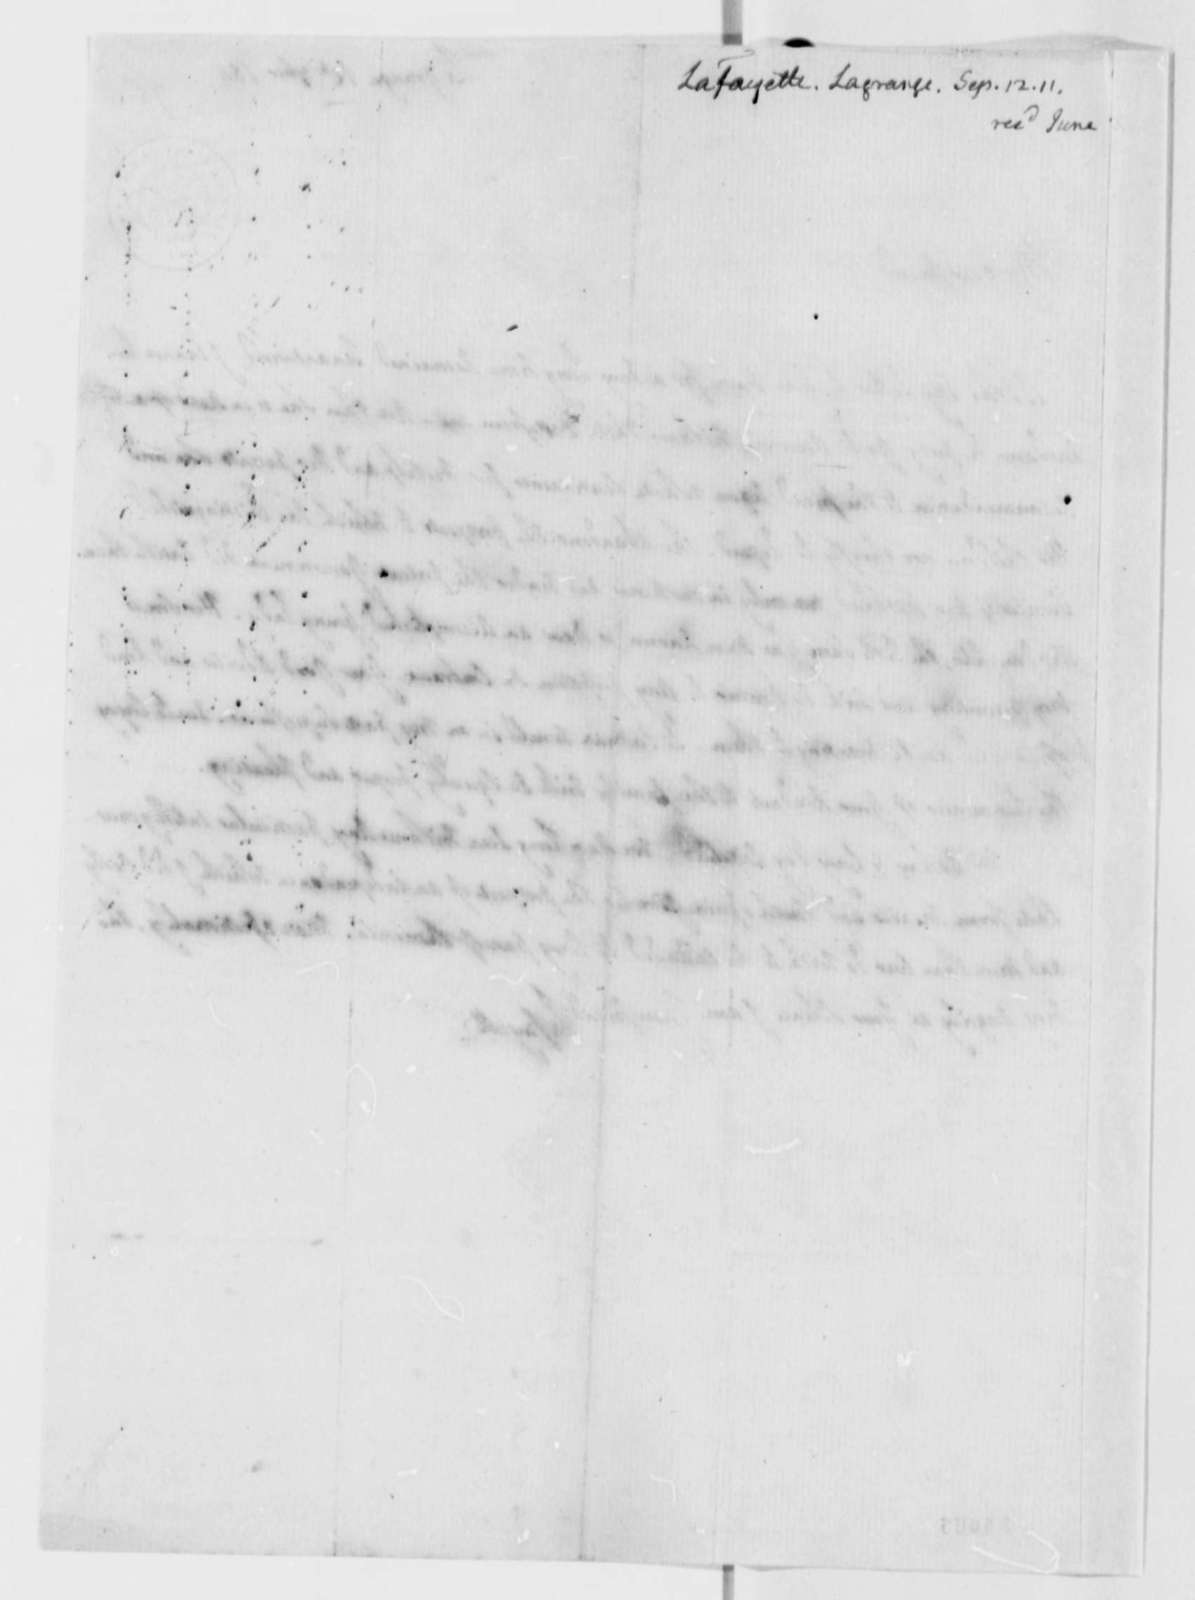 Marie Joseph Paul Yves Roch Gilbert du Motier, Marquis de Lafayette to Thomas Jefferson, September 12, 1811